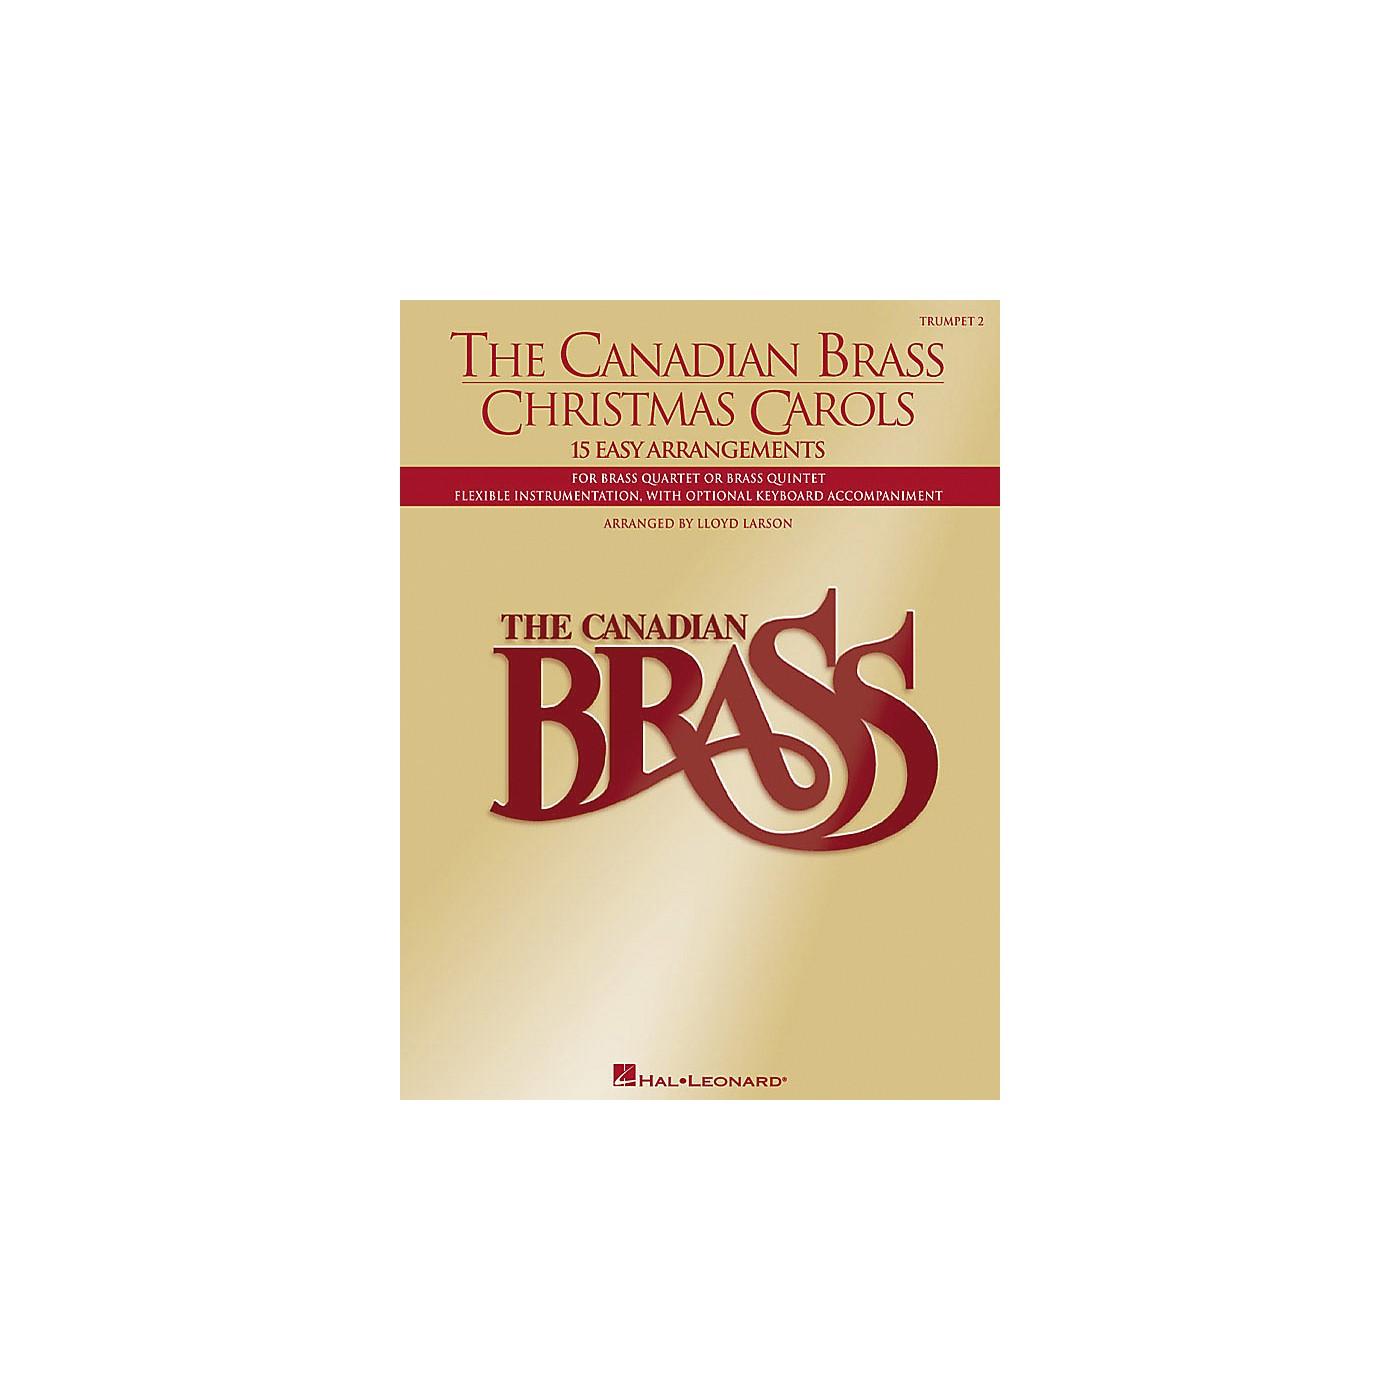 Hal Leonard Canadian Brass Christmas Carols (Brass / Trumpet) thumbnail